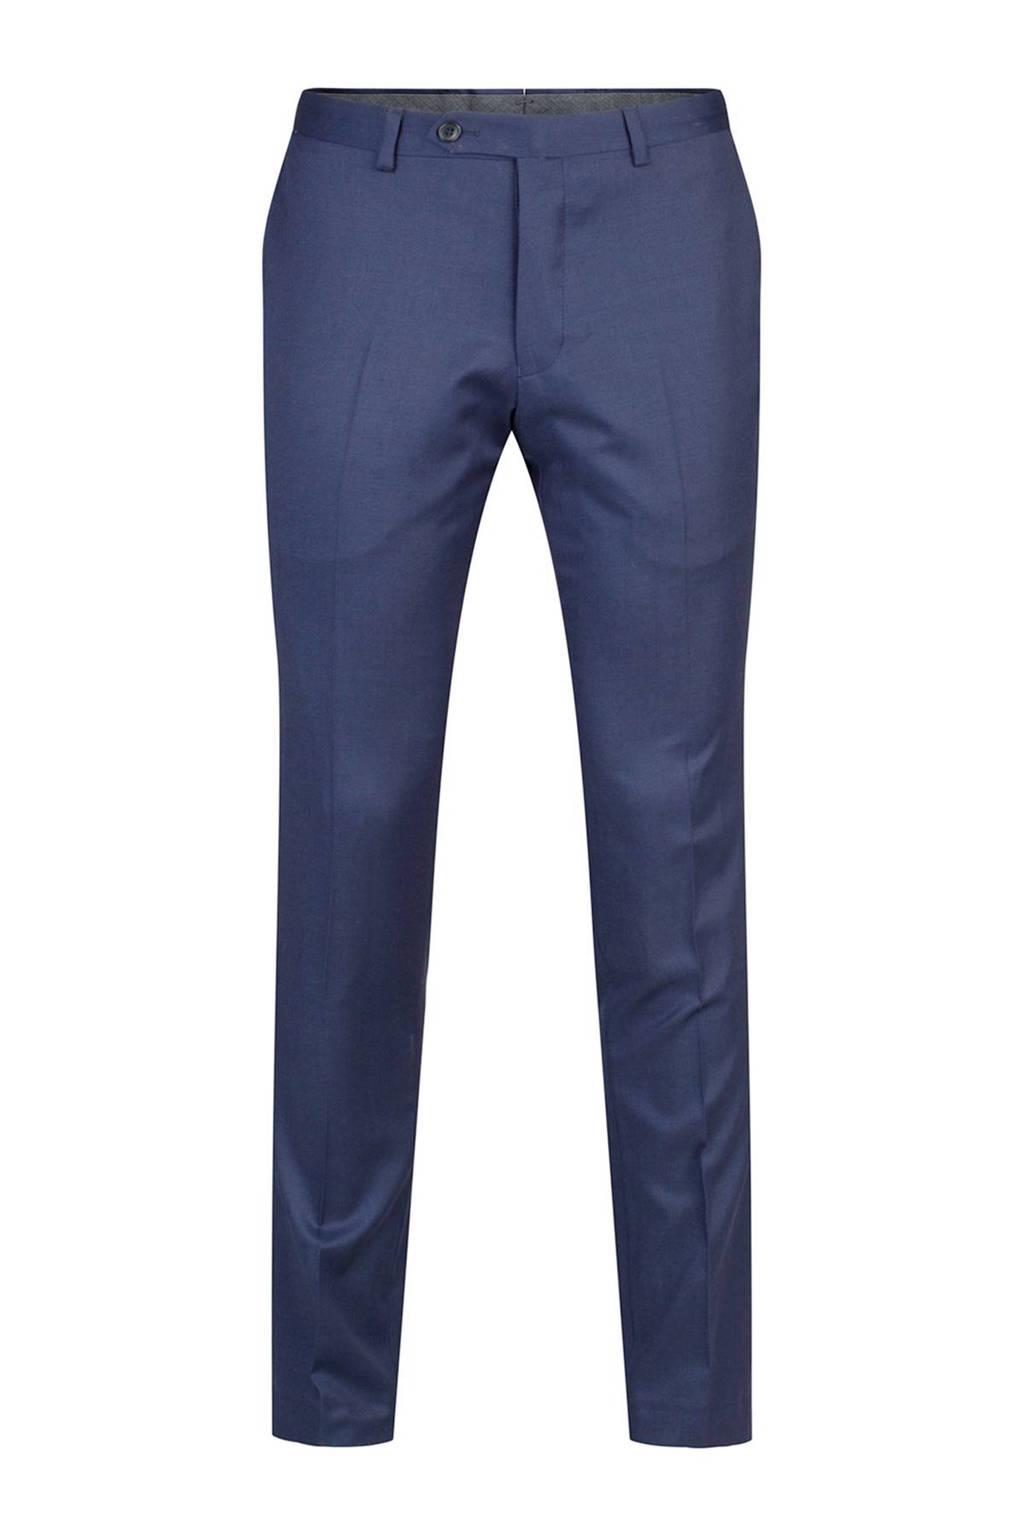 WE Fashion x Van Gils Dayton slim fit pantalon, Donkerblauw